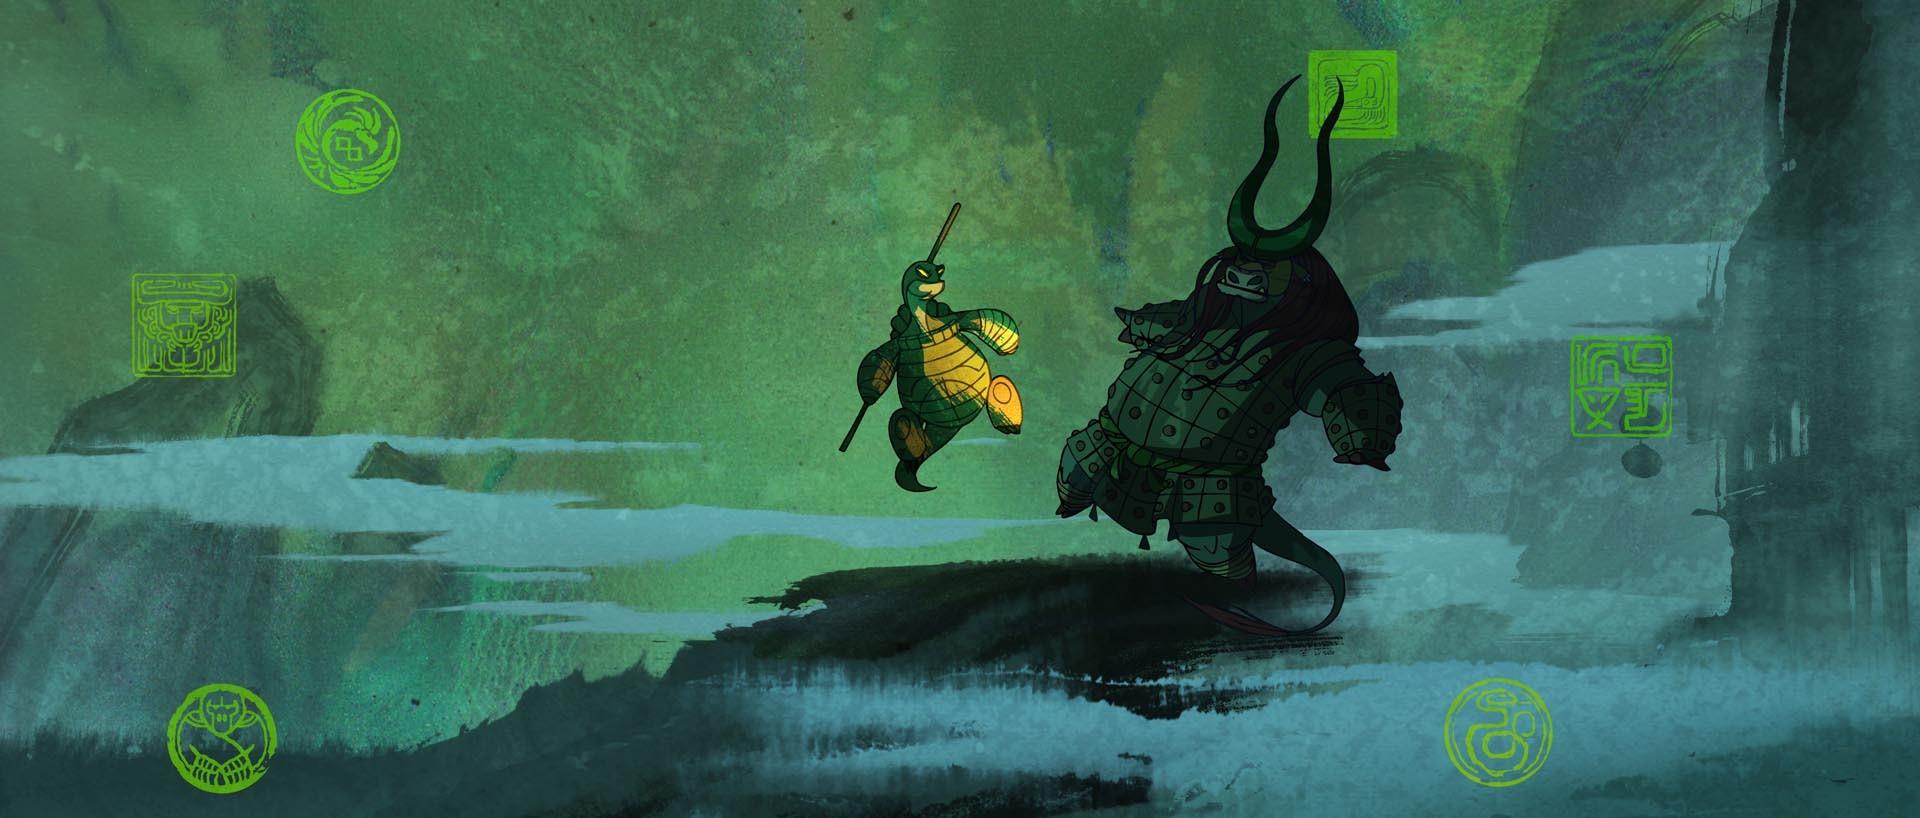 Oogway vs Kai: concept art for Kung Fu Panda 3 by Raymond Zibach.